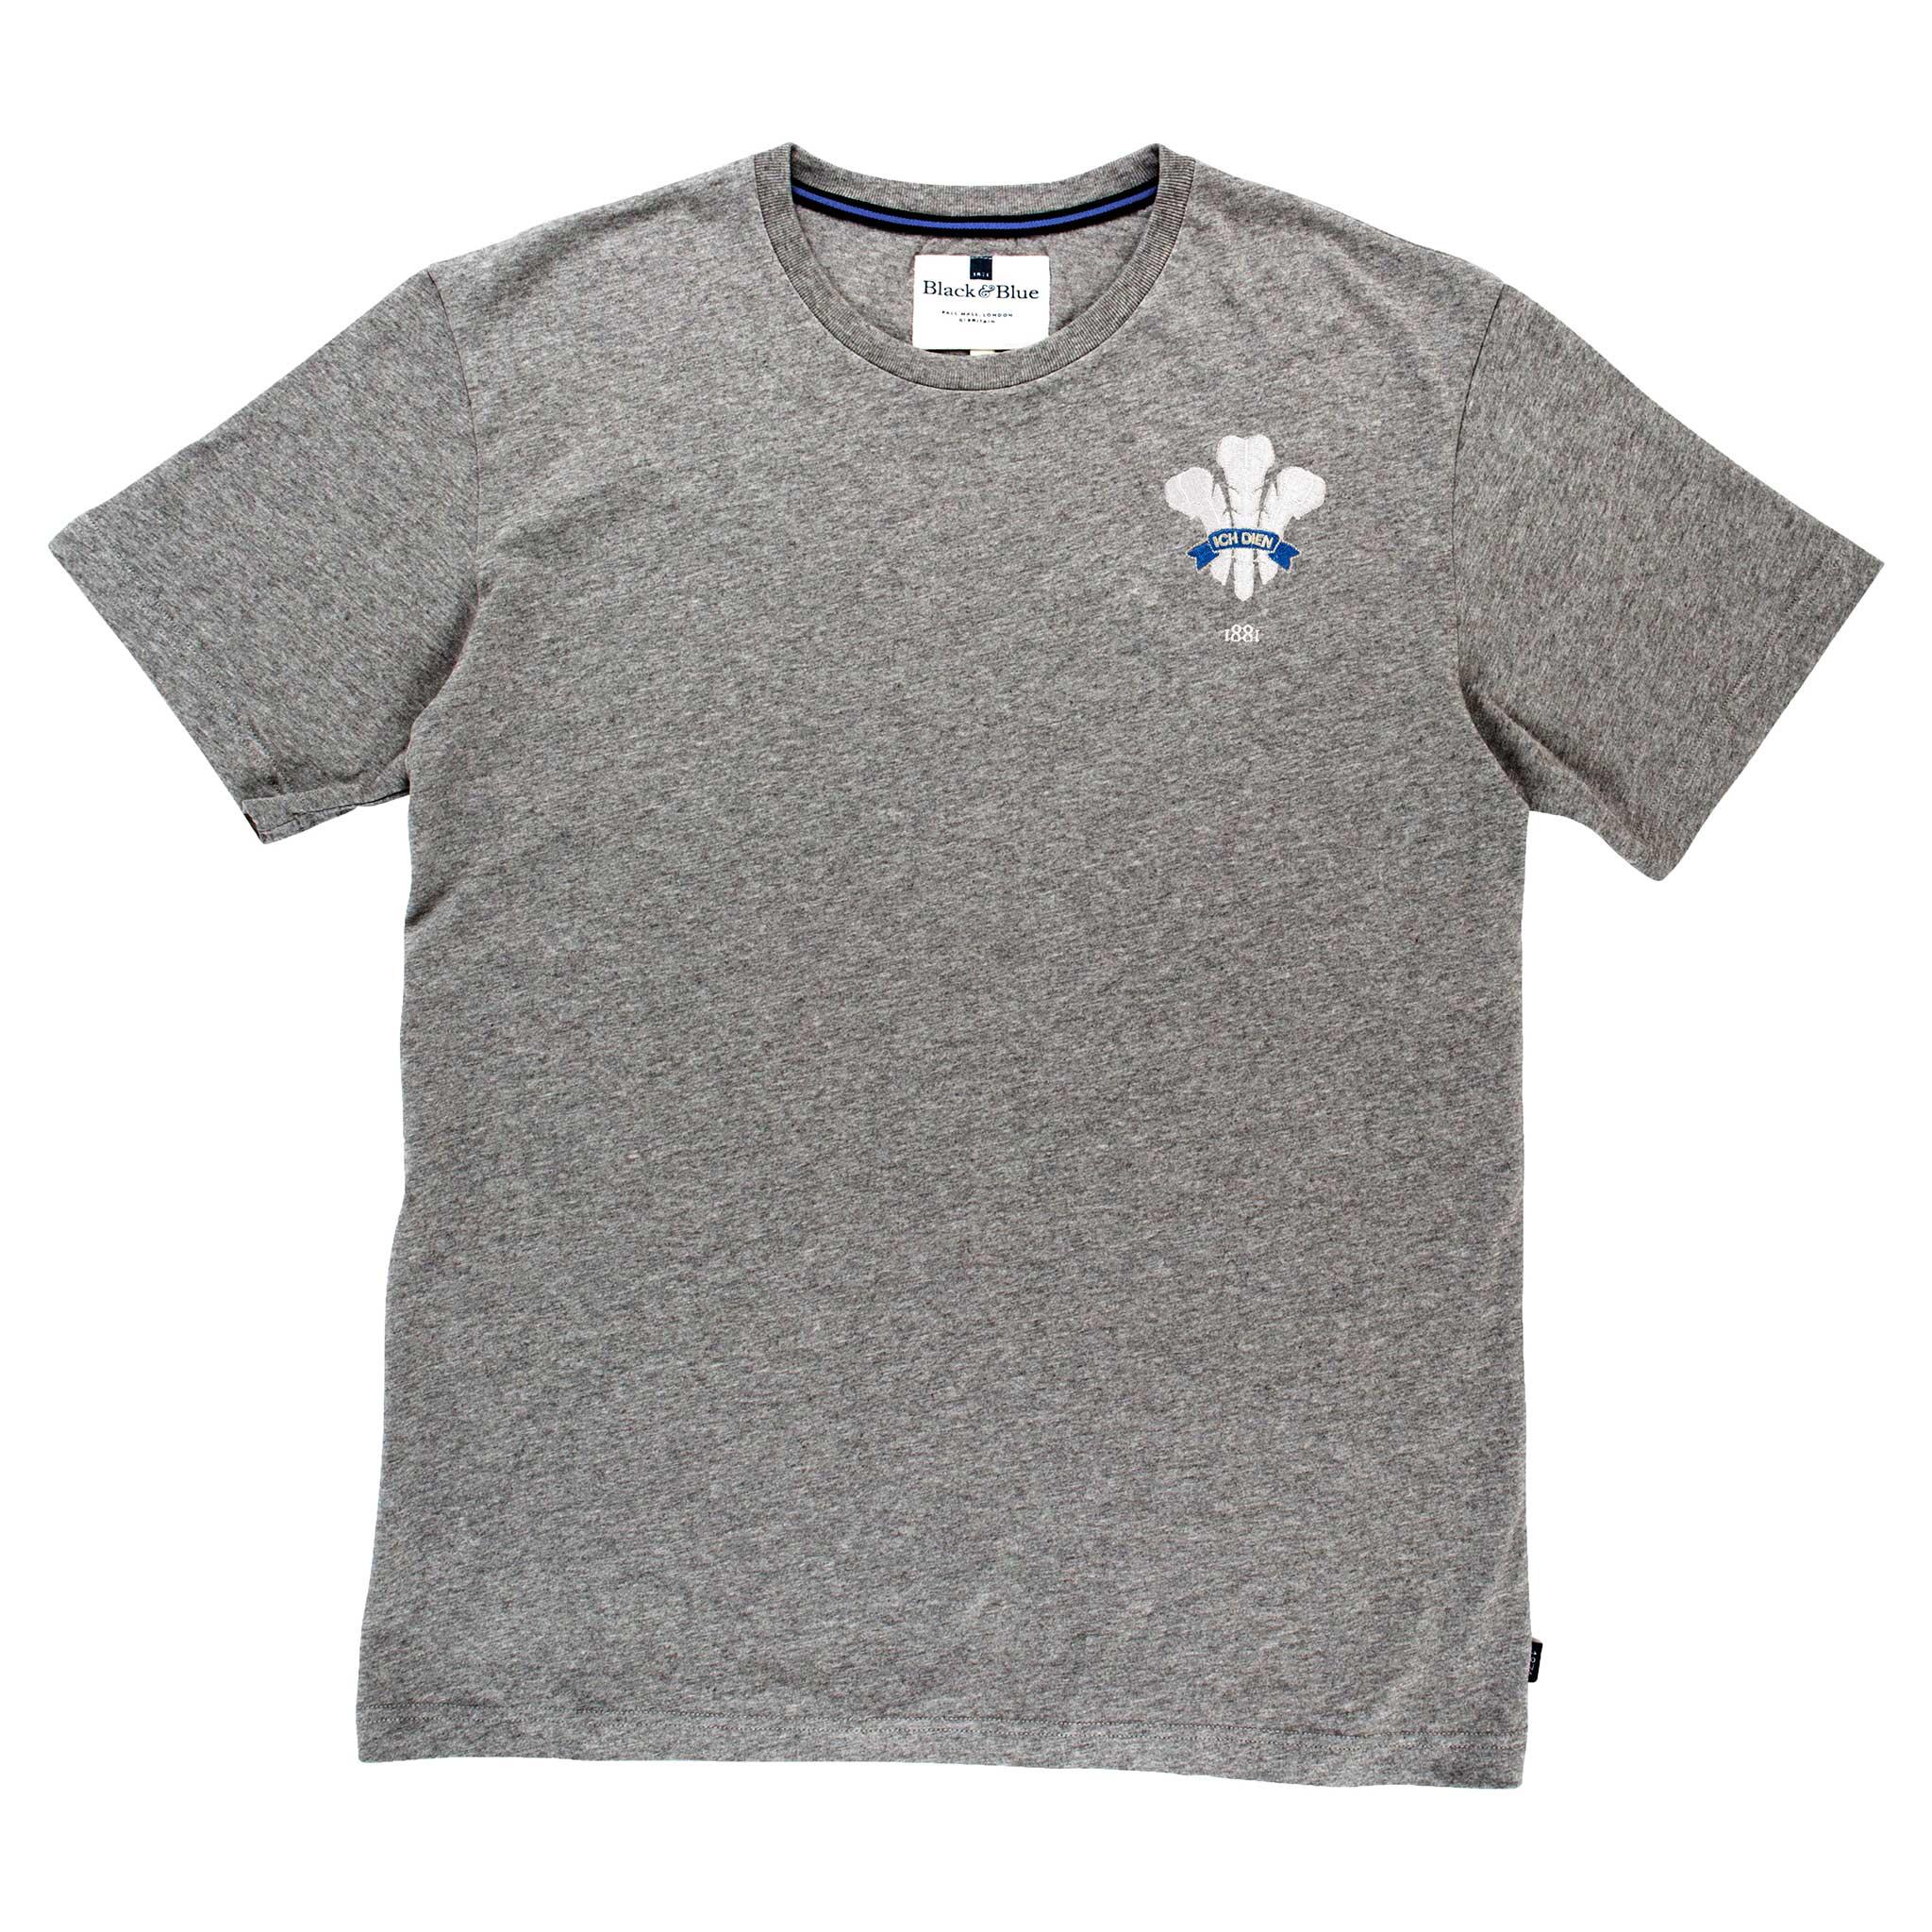 Wales 1881 Grey Tshirt_Front